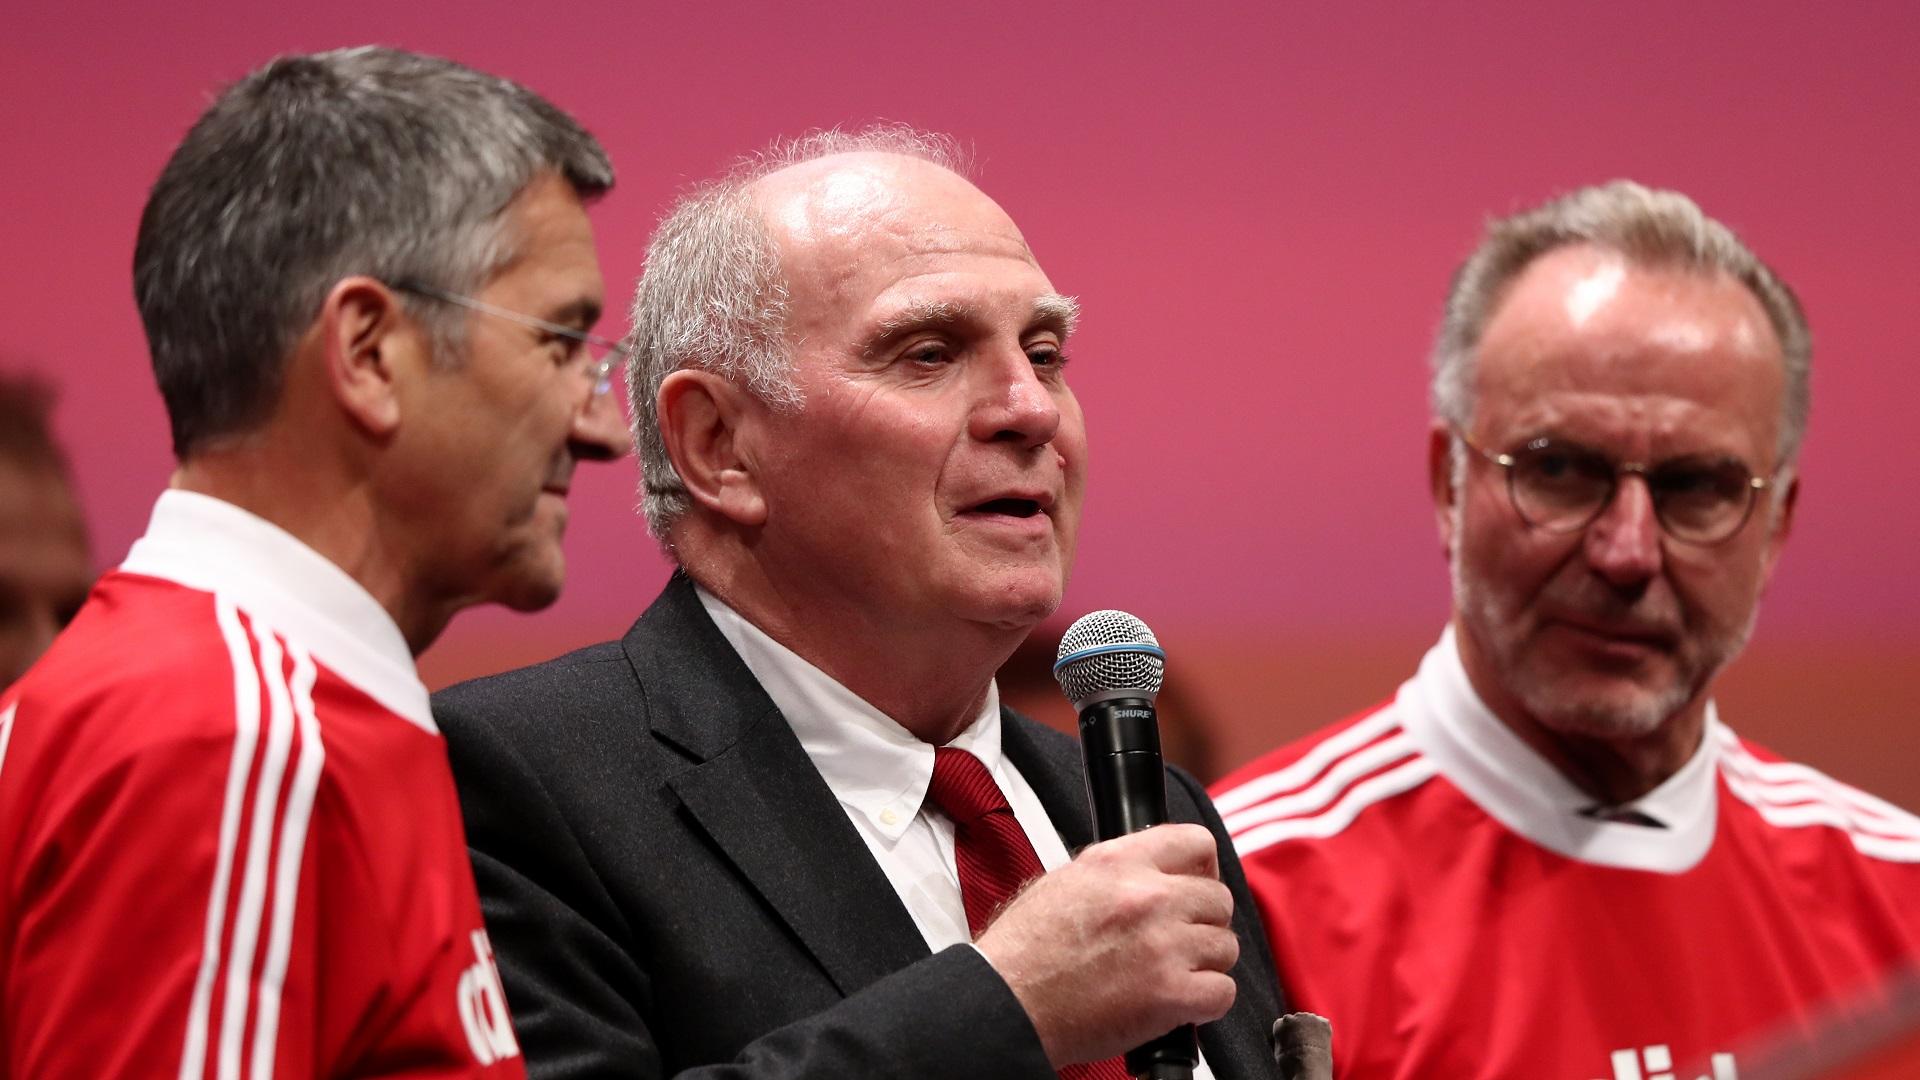 Bayern - Uli Hoeness critique la stratégie du Borussia Dortmund